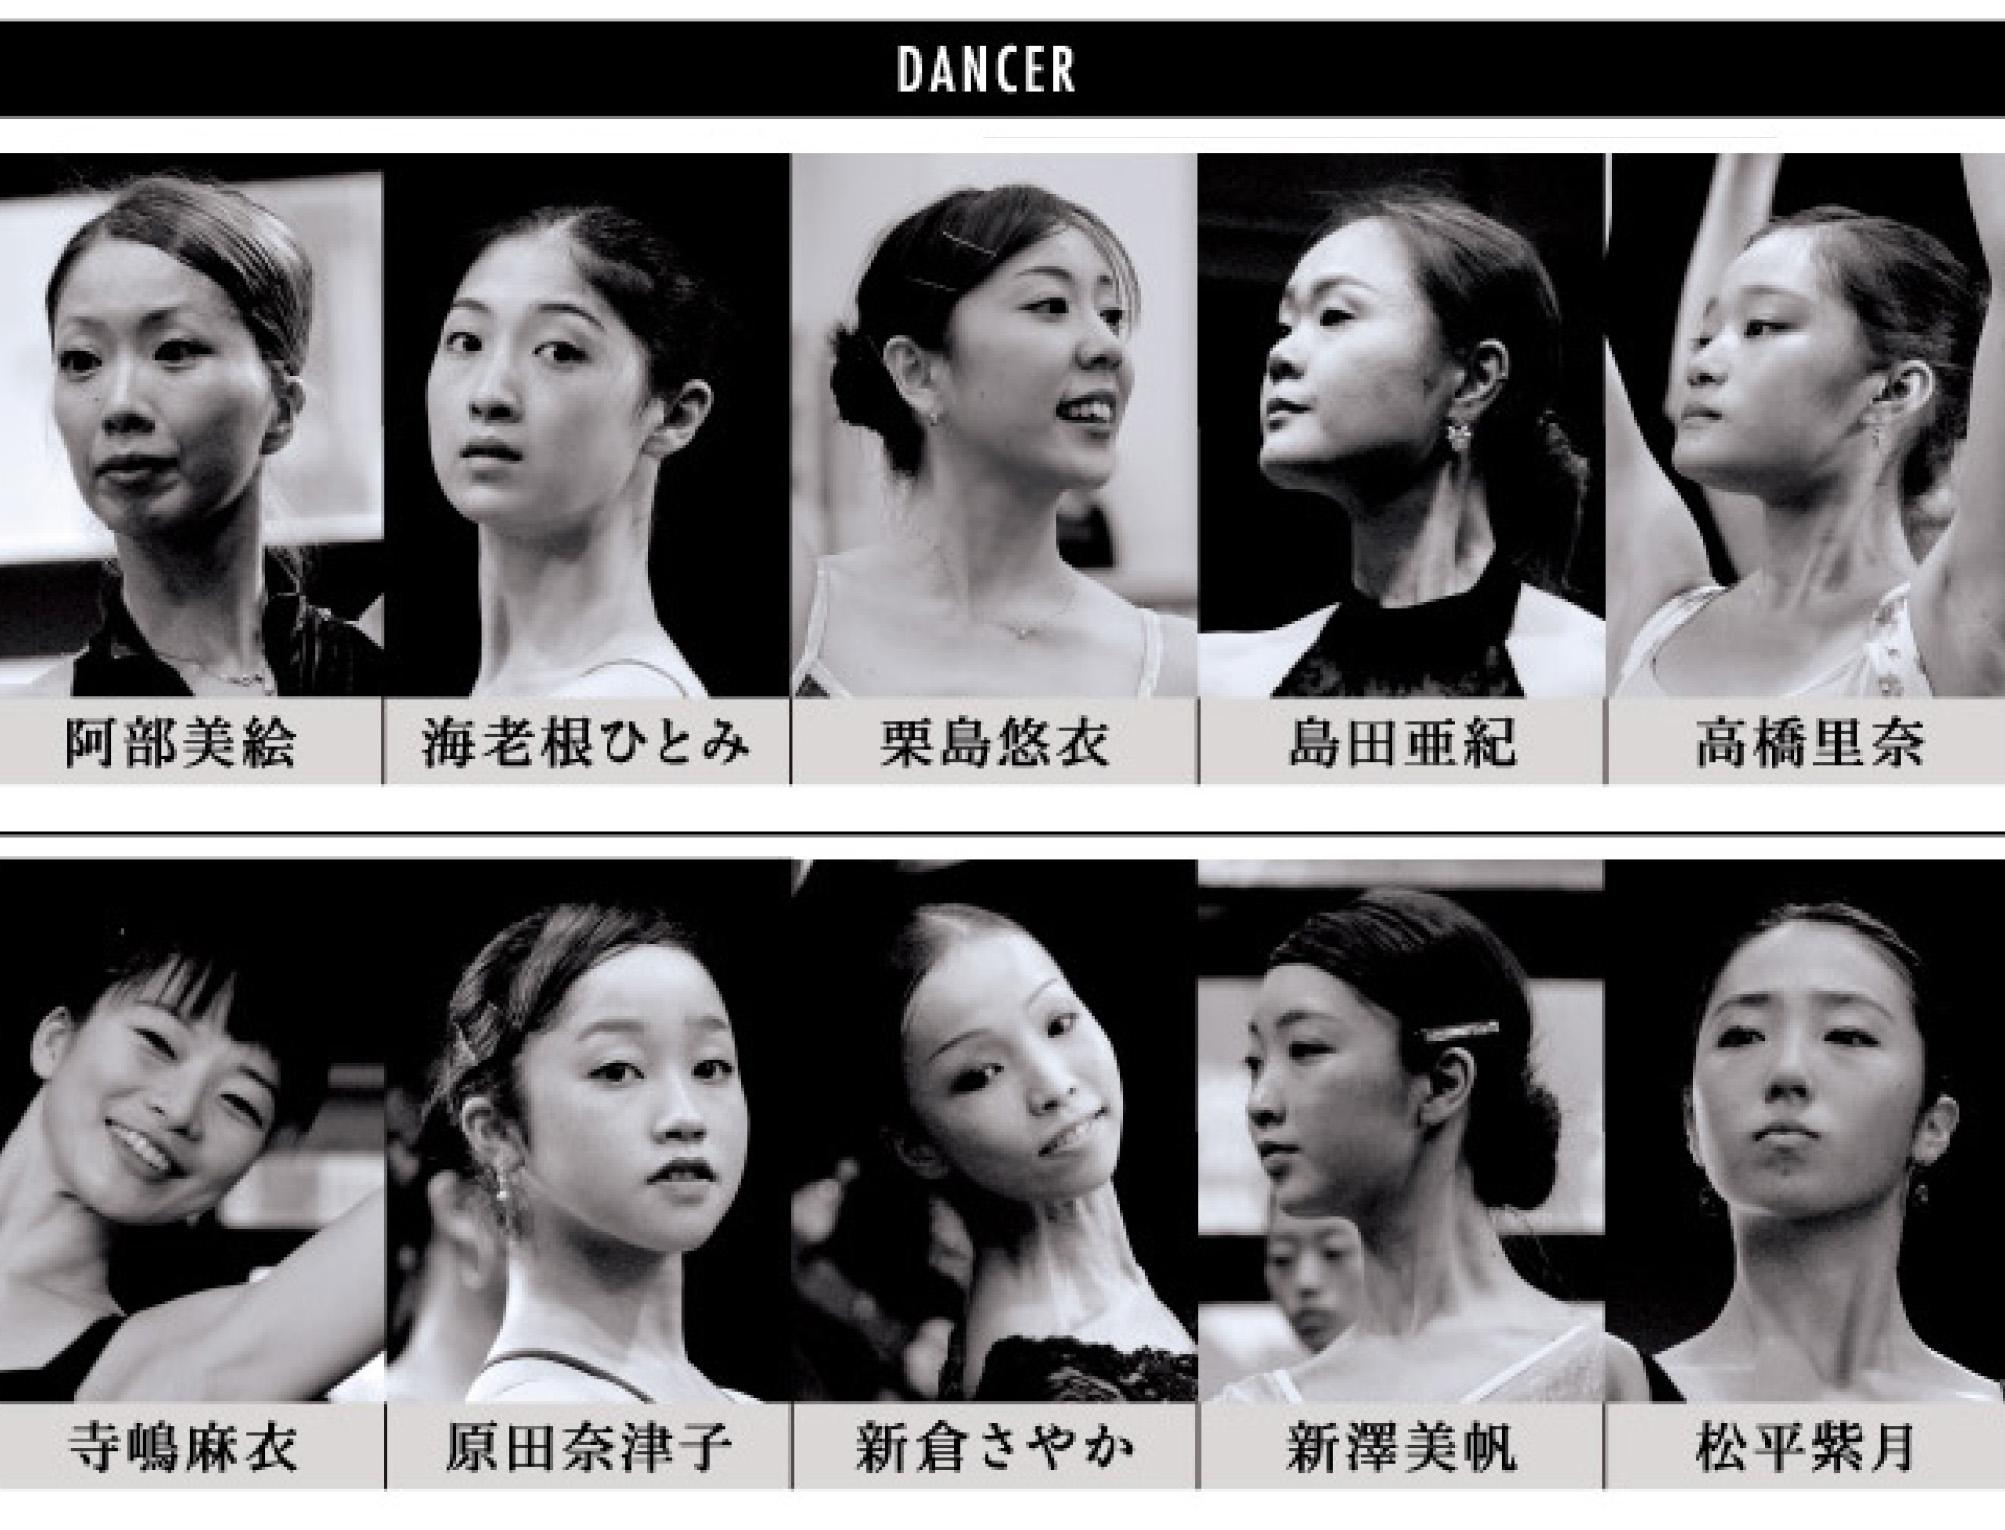 dancerall